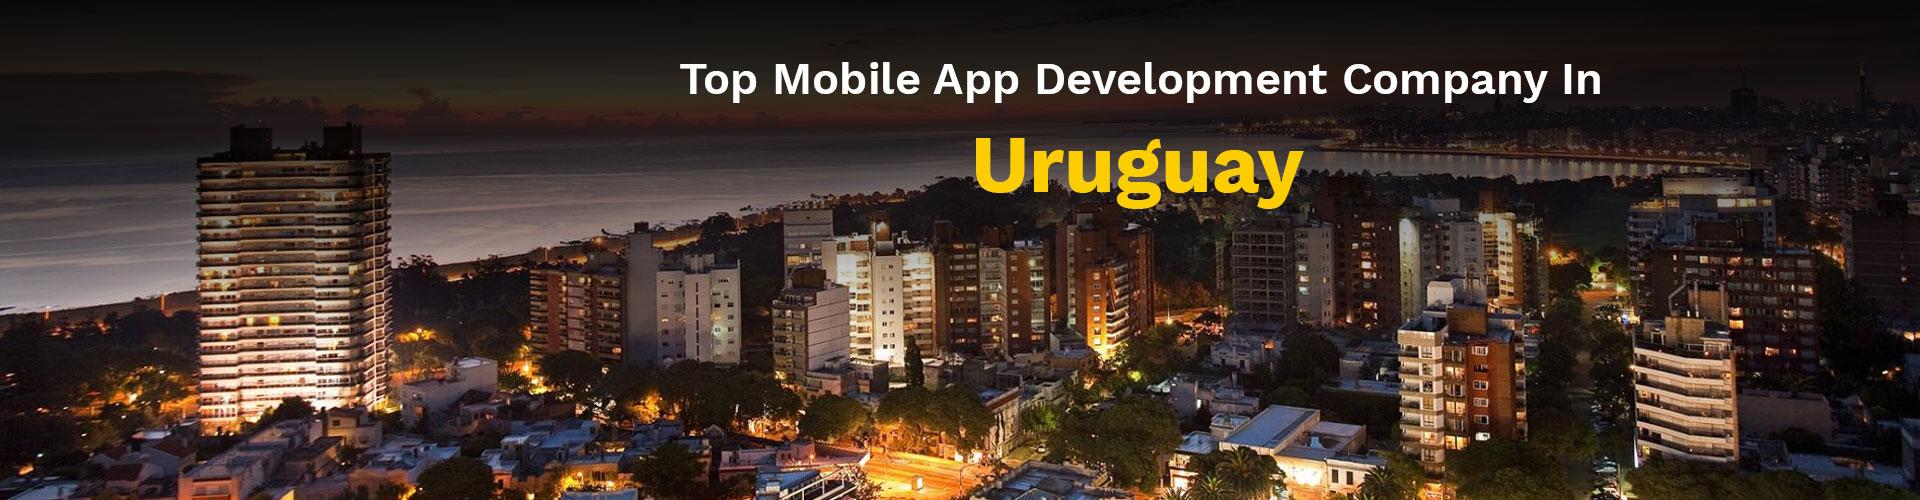 mobile app development company uruguay